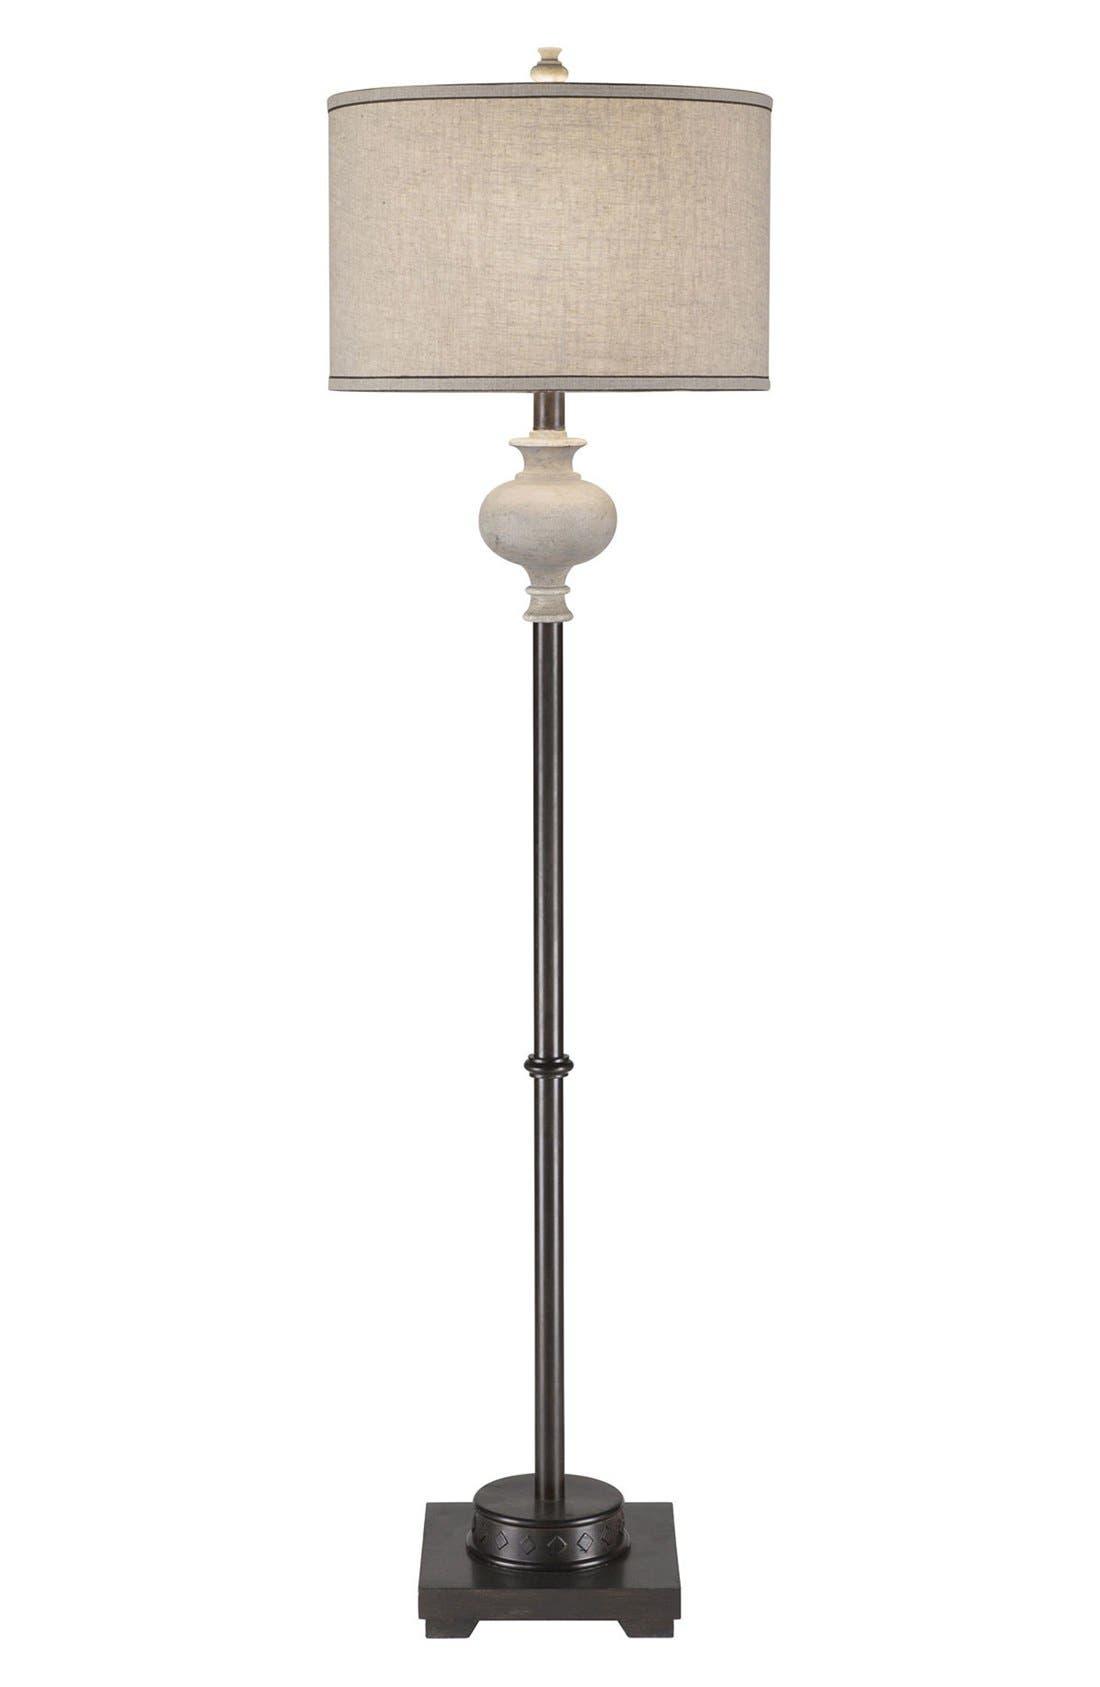 JAlexander Whitewash & Bronze Floor Lamp,                             Main thumbnail 1, color,                             100